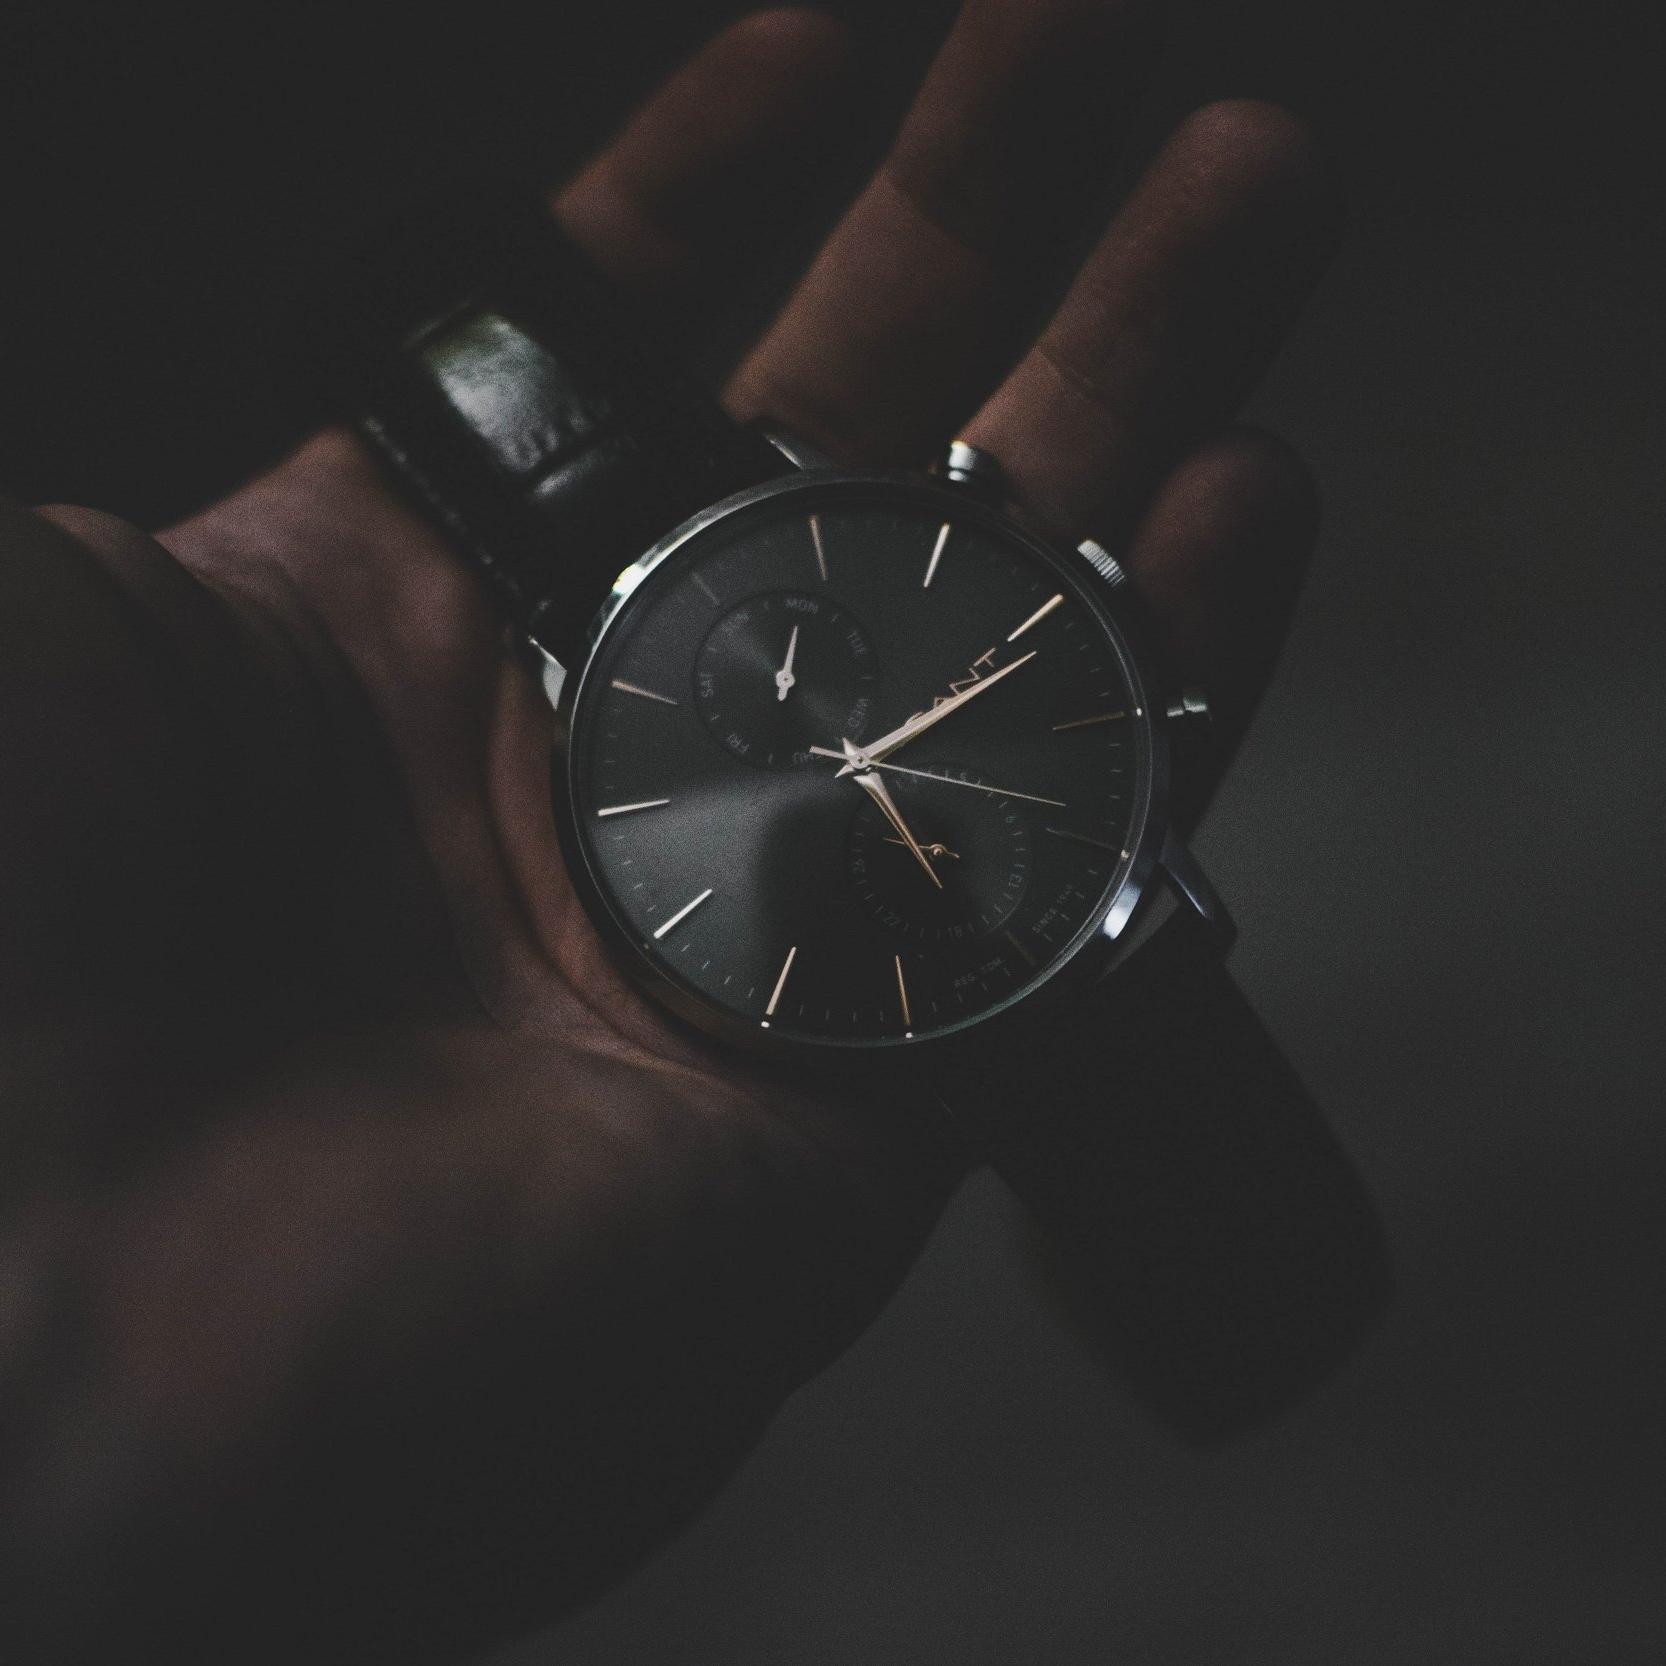 AMJ Watch services